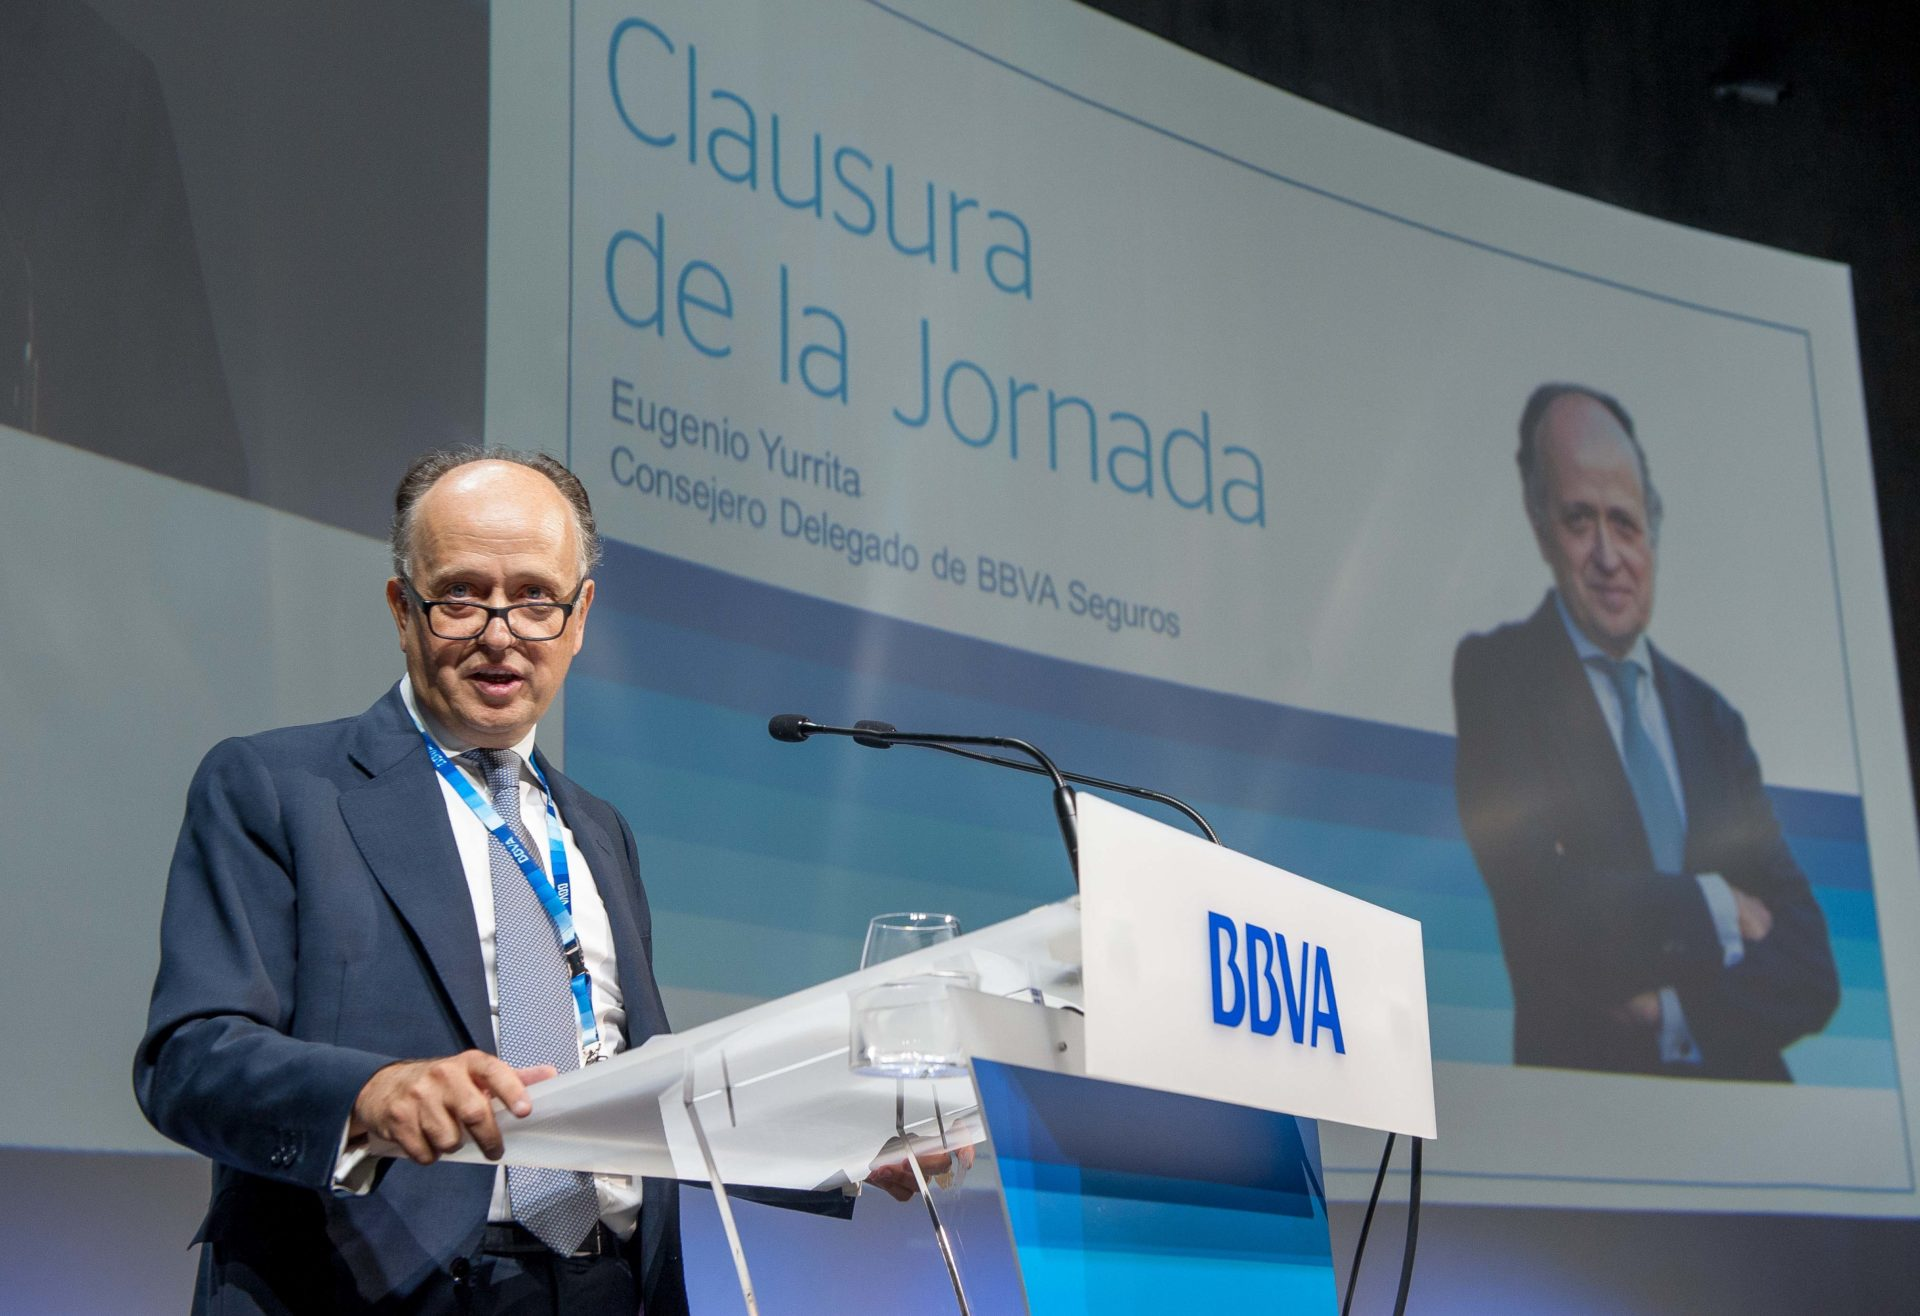 Fotografia de foro expertos pensiones jubilacion BBVA